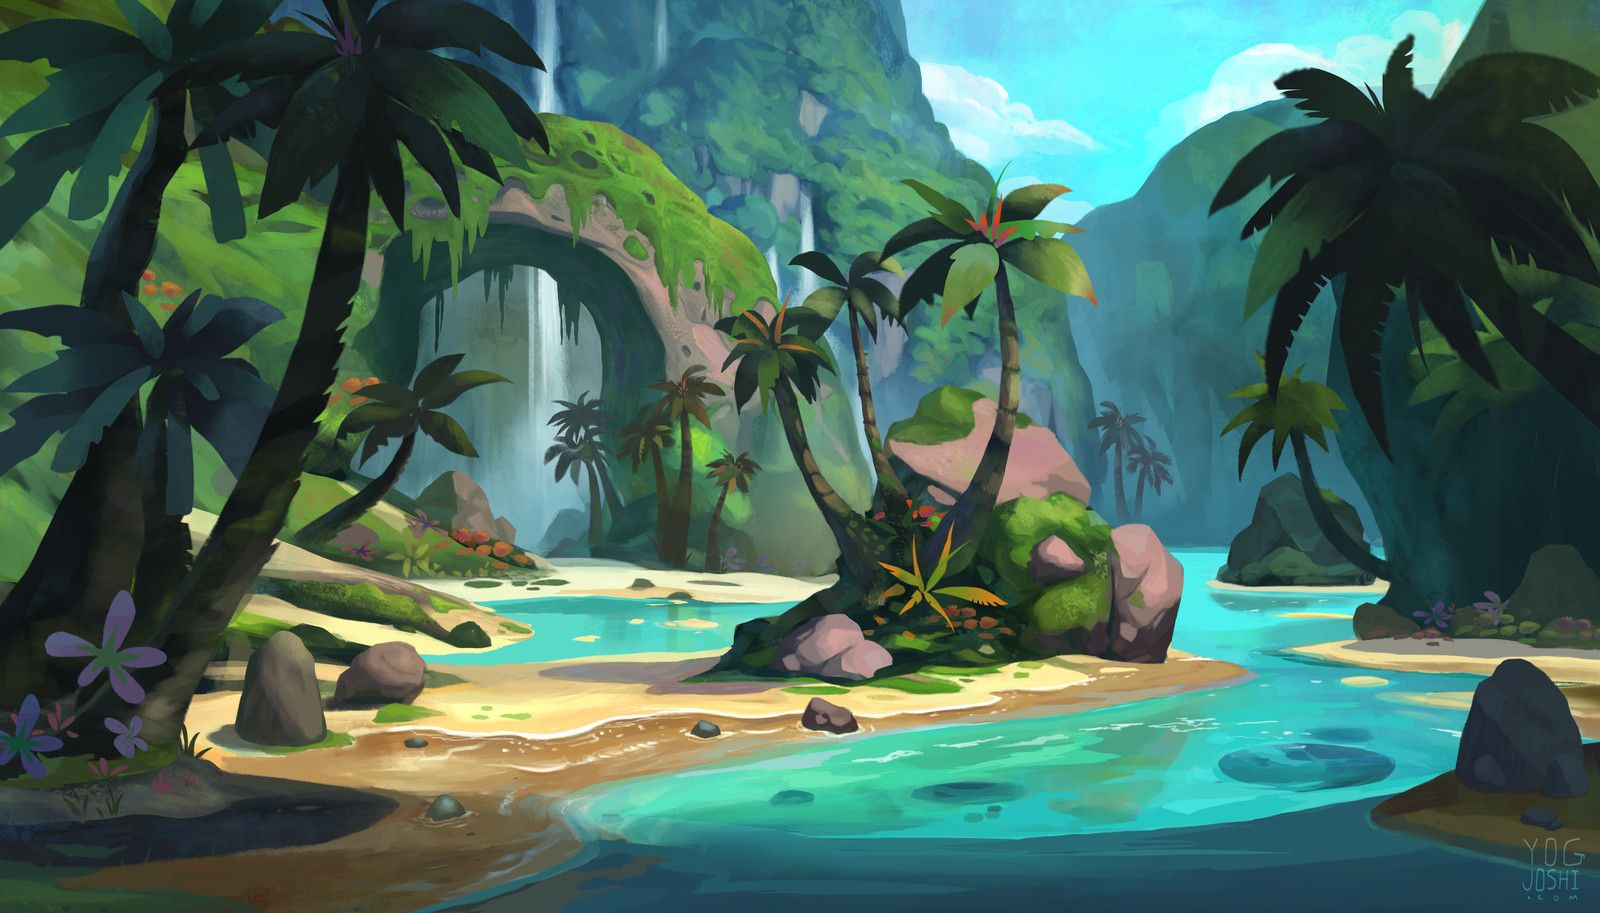 Tropical Environment Yog Joshi On Artstation At Https Www Artstation Com Artwork Mlnba Environment Painting Landscape Concept Moana Concept Art